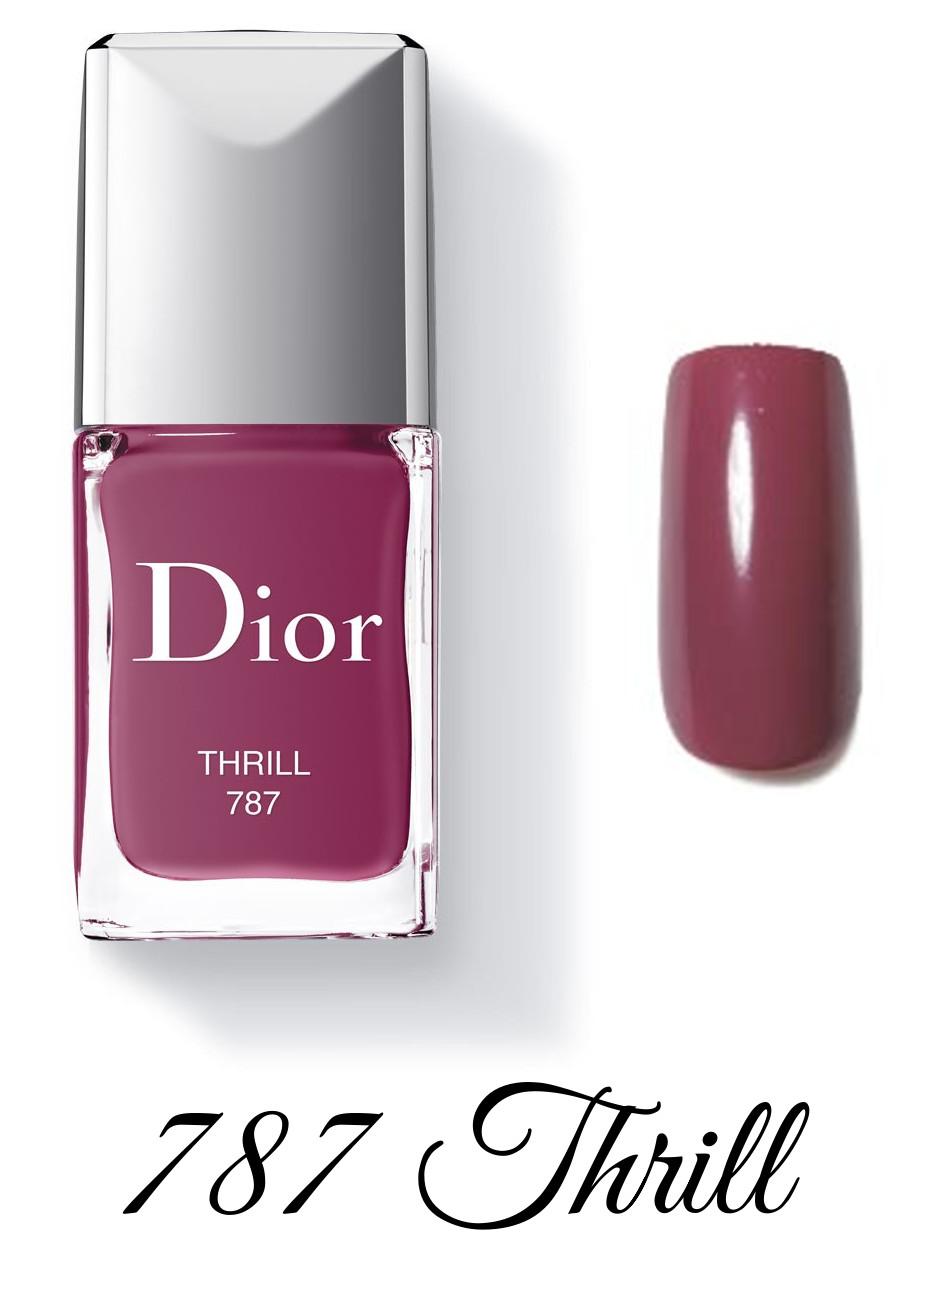 Dior Spring 2018 Collection GLOW ADDICT Dior Vernis 787 Thrill